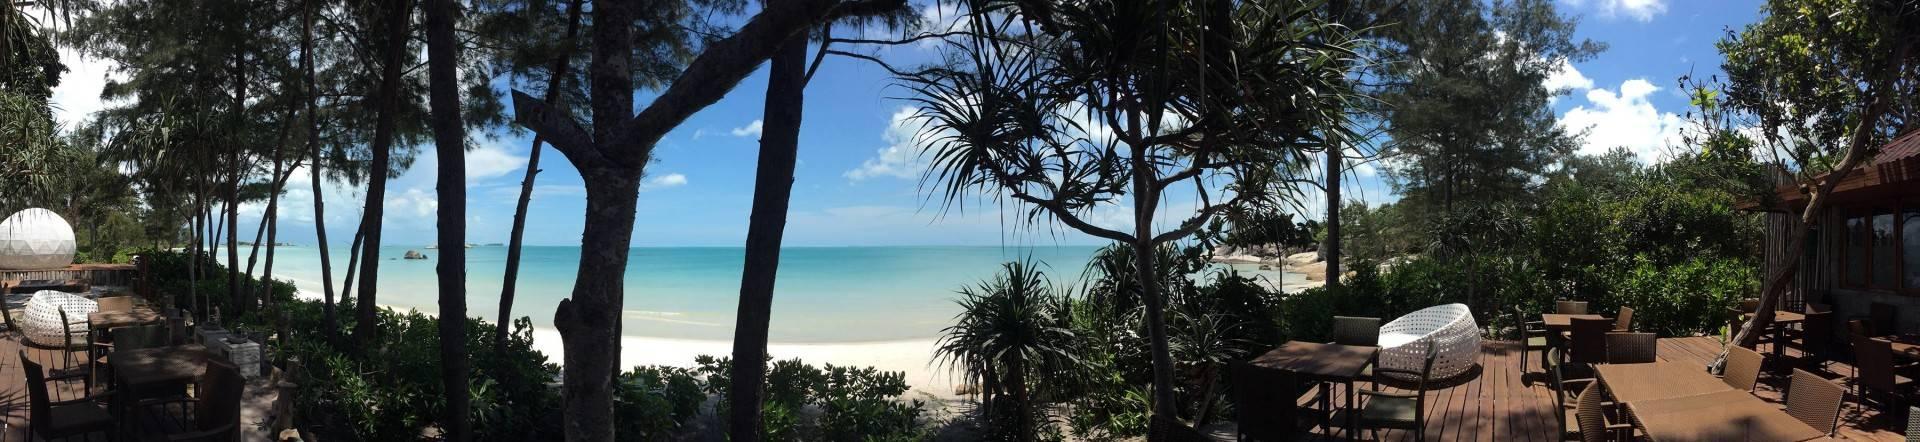 Raw Architecture Arumdalu Belitung Belitung Beach View Tropis  1638